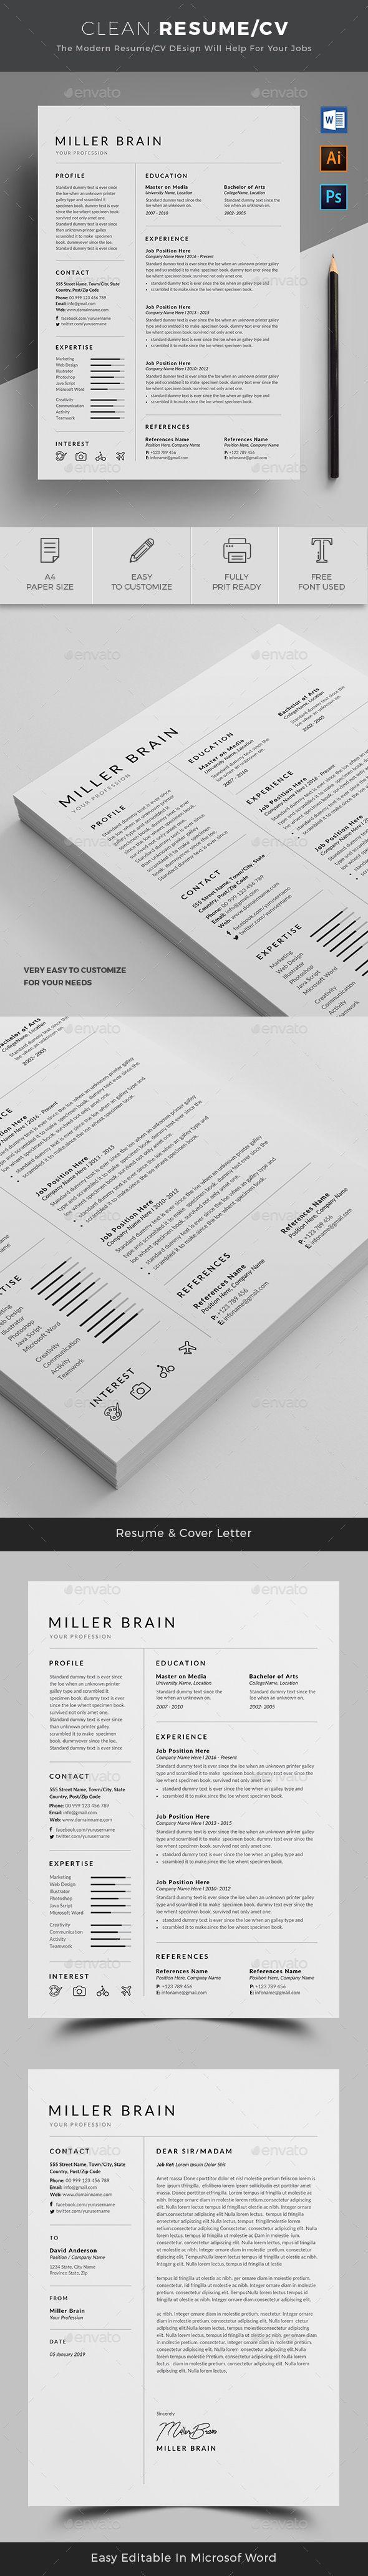 Resume Templates : Resume Template PSD, AI Illustrator, MS ...